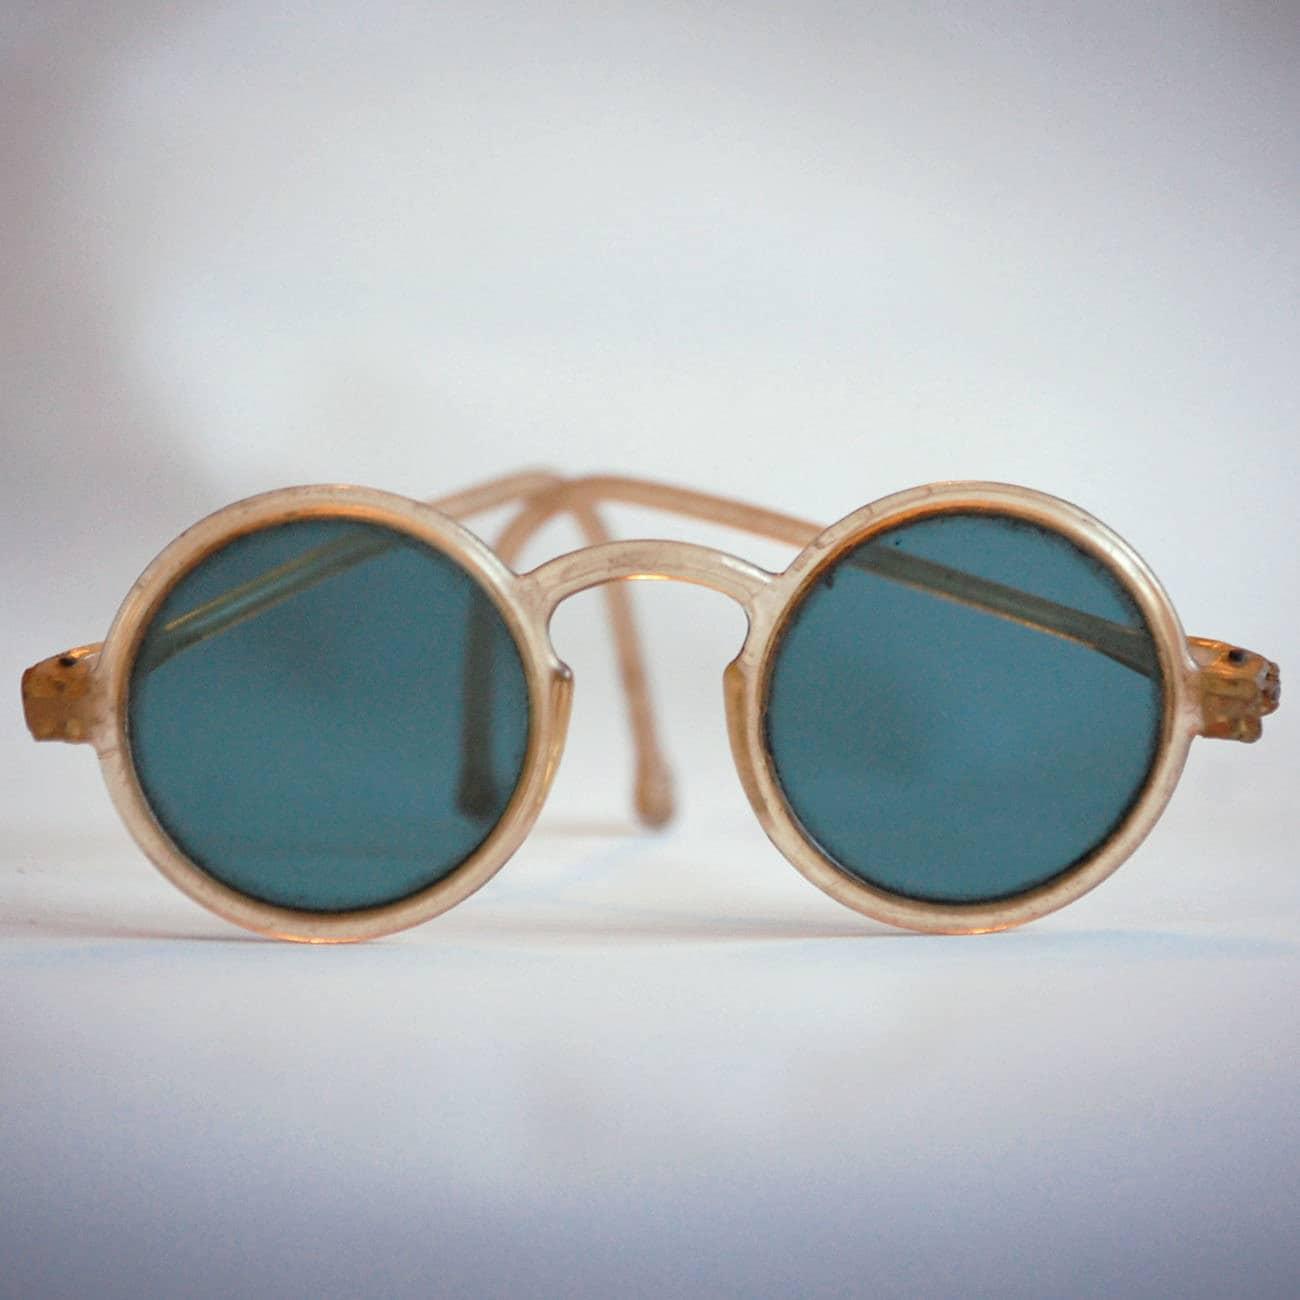 Plastic Glasses Frame Bent : Round Antique Sunglasses with Translucent Plastic Frames